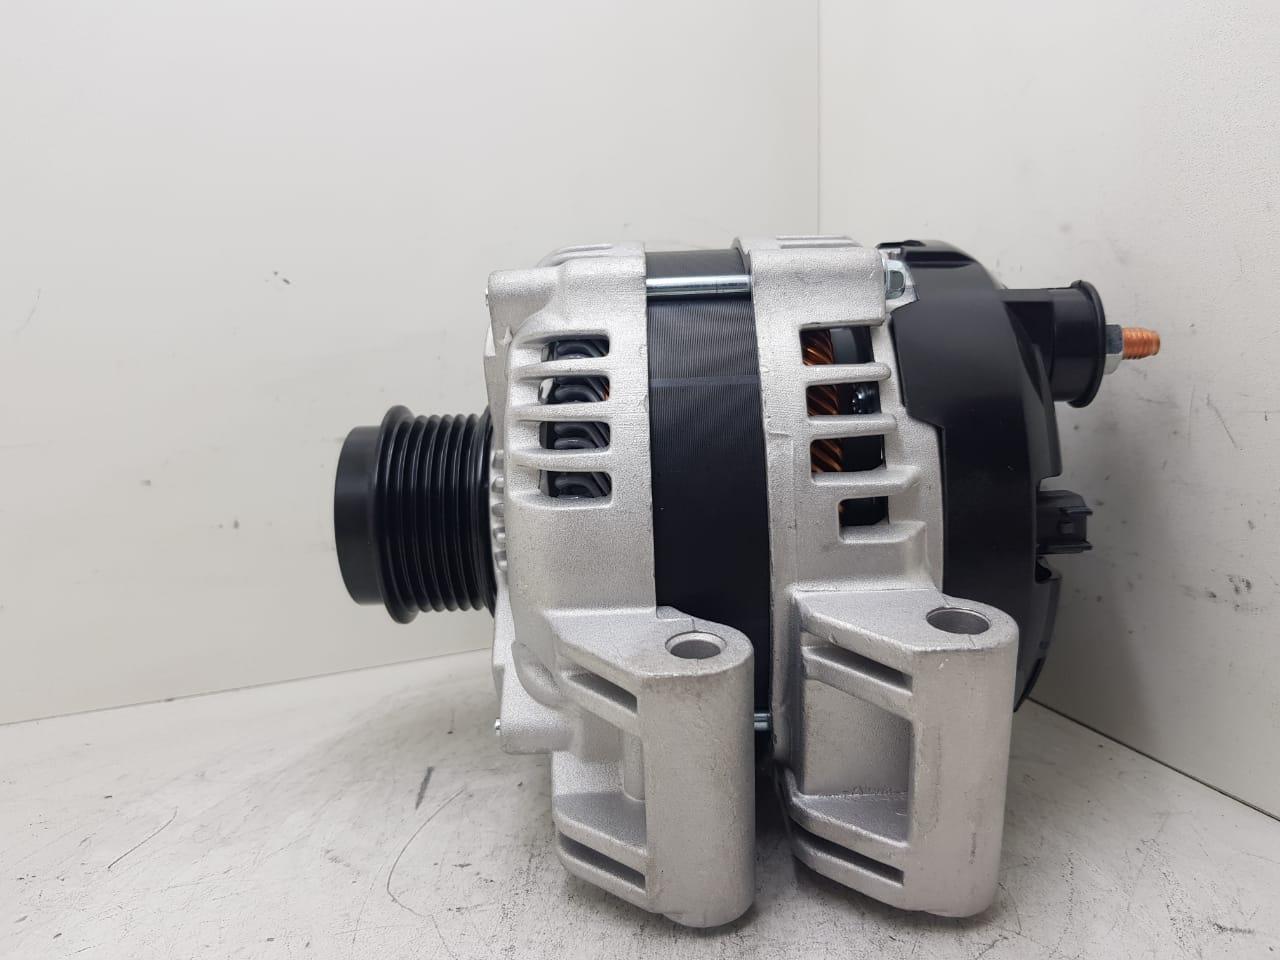 ALTERNADOR JEEP CHEROKEE CHRYSLER 300C 2012 3.6 V6 Dodge Durango 5.7 4210007040 421007041 P04801833AB D 10245 AEC21081